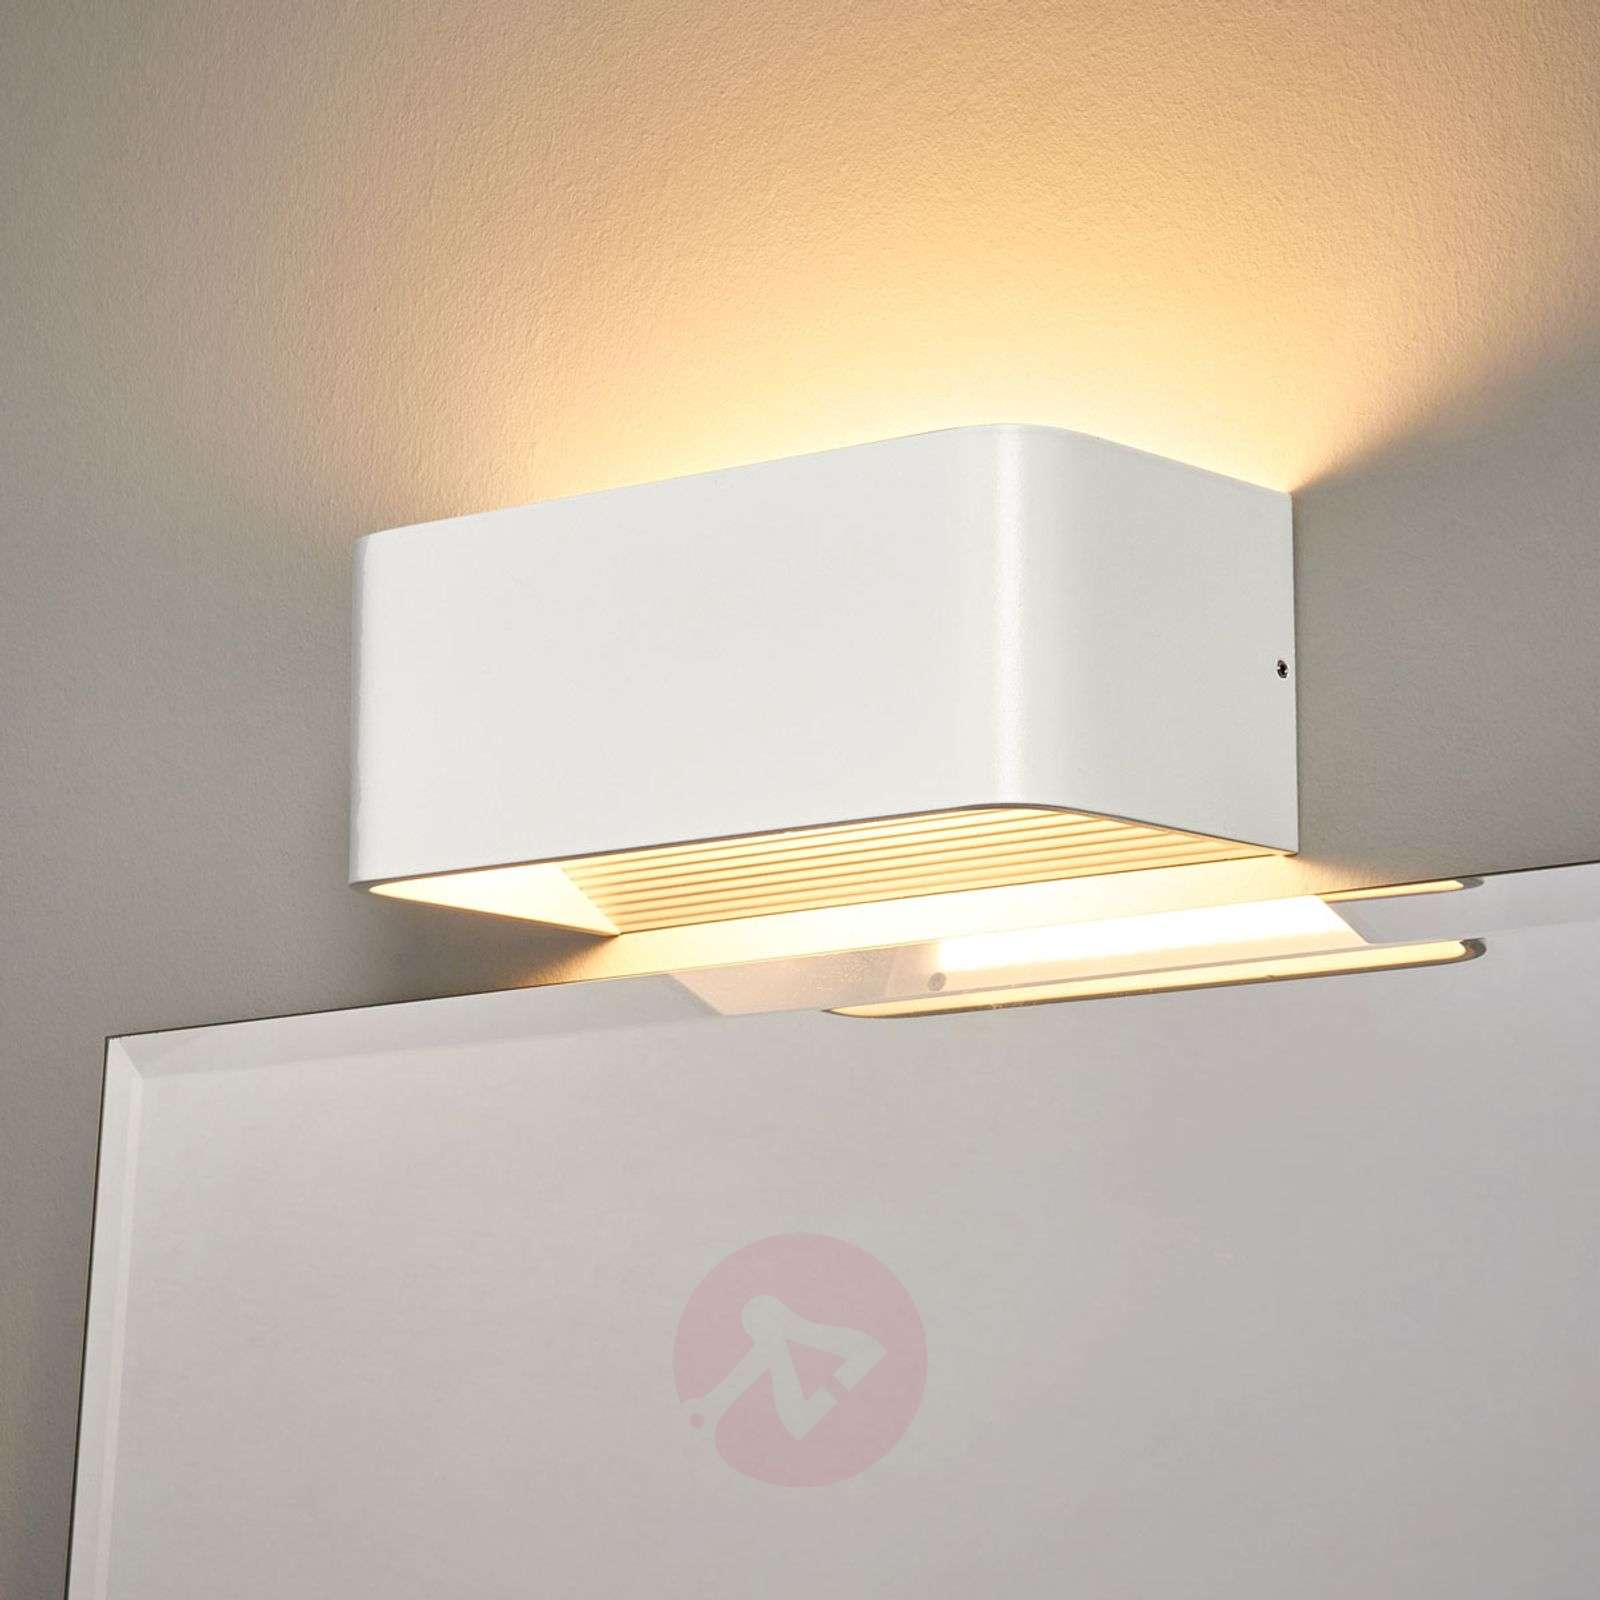 Simple LED wall light Celia for the bathroom   Lights.ie